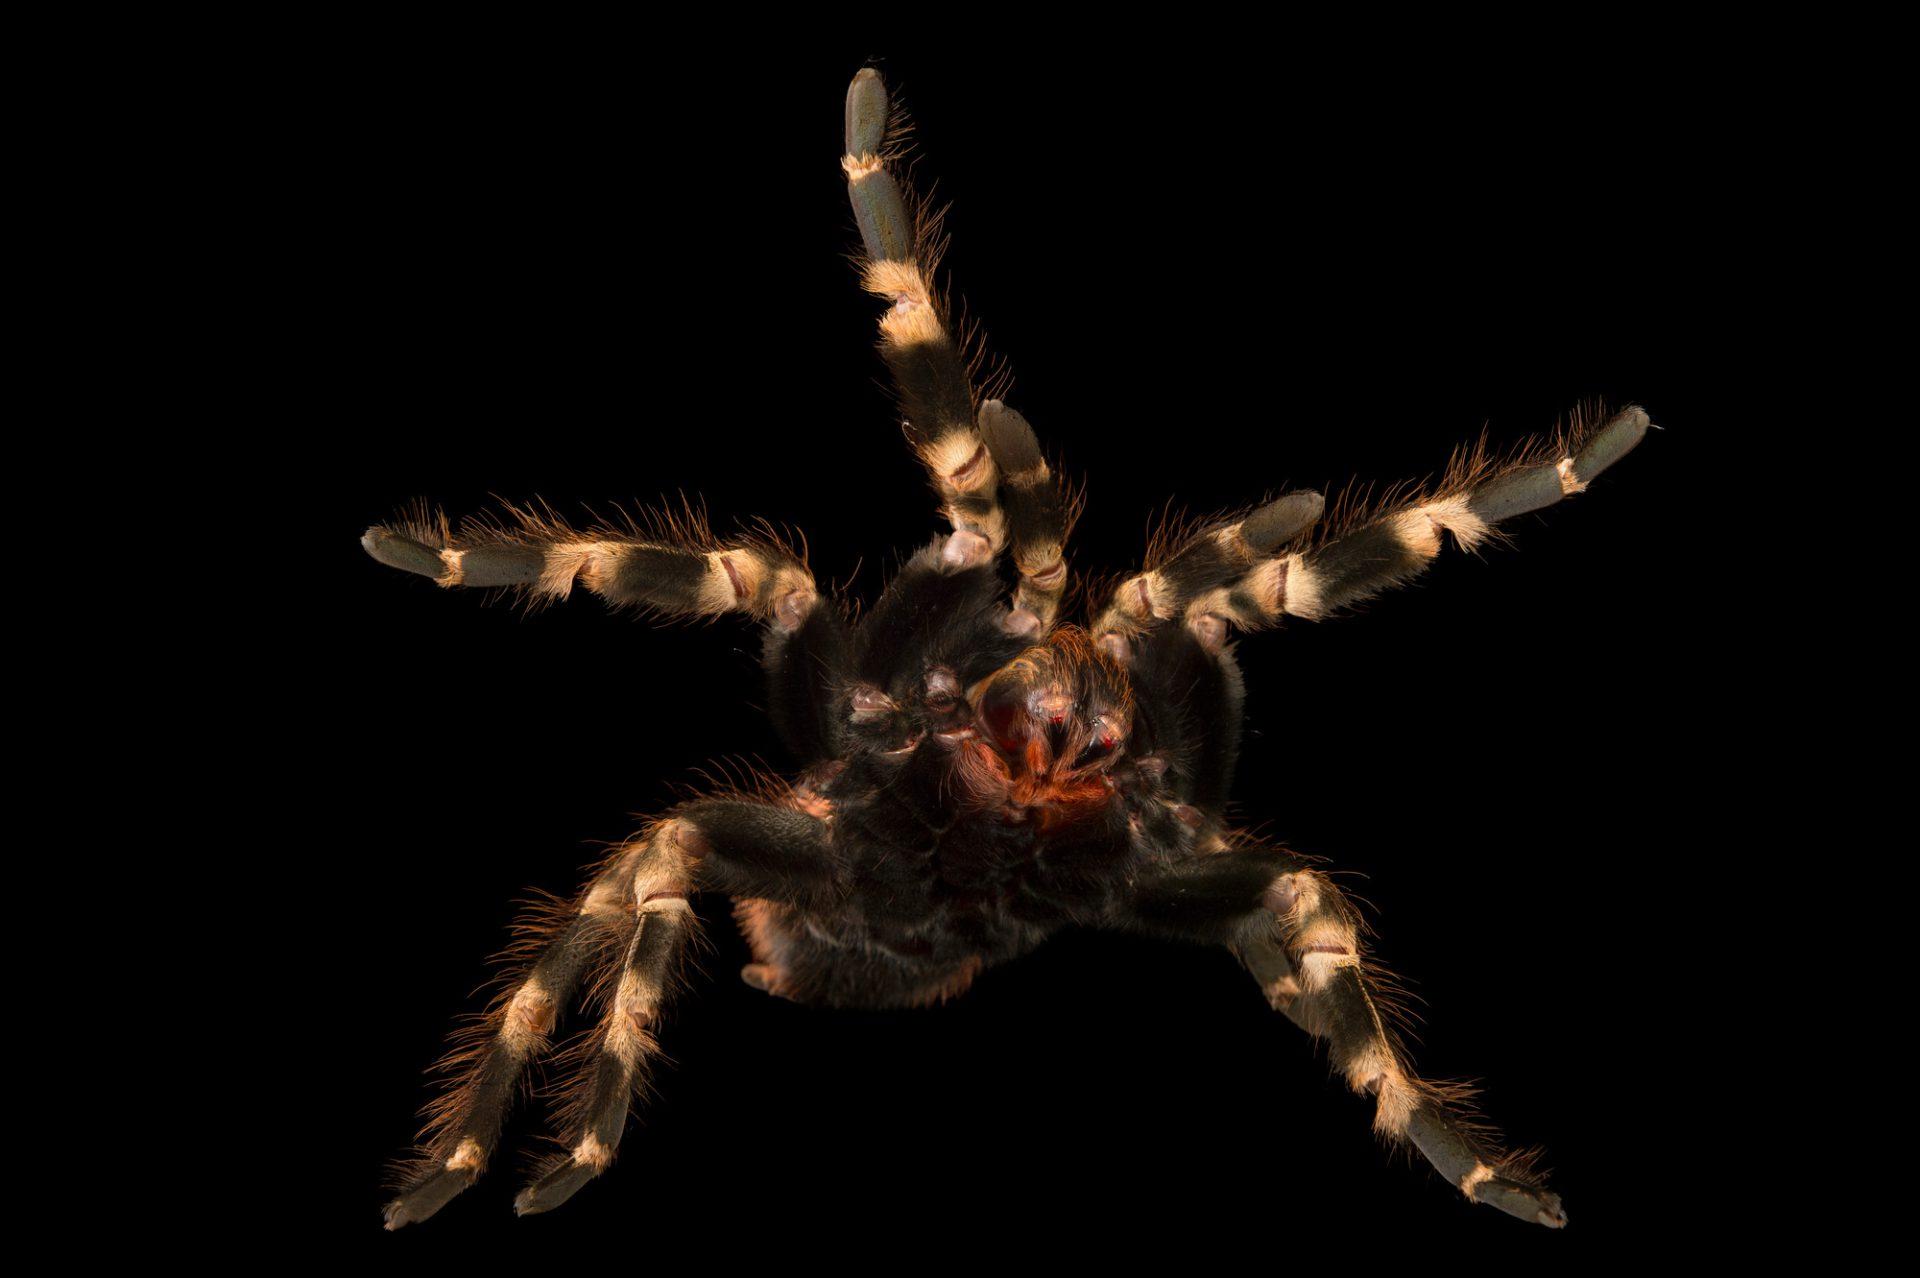 Photo: A Brazilian red and white tarantula (Nhandu chromatus) at the Virginia Zoo.